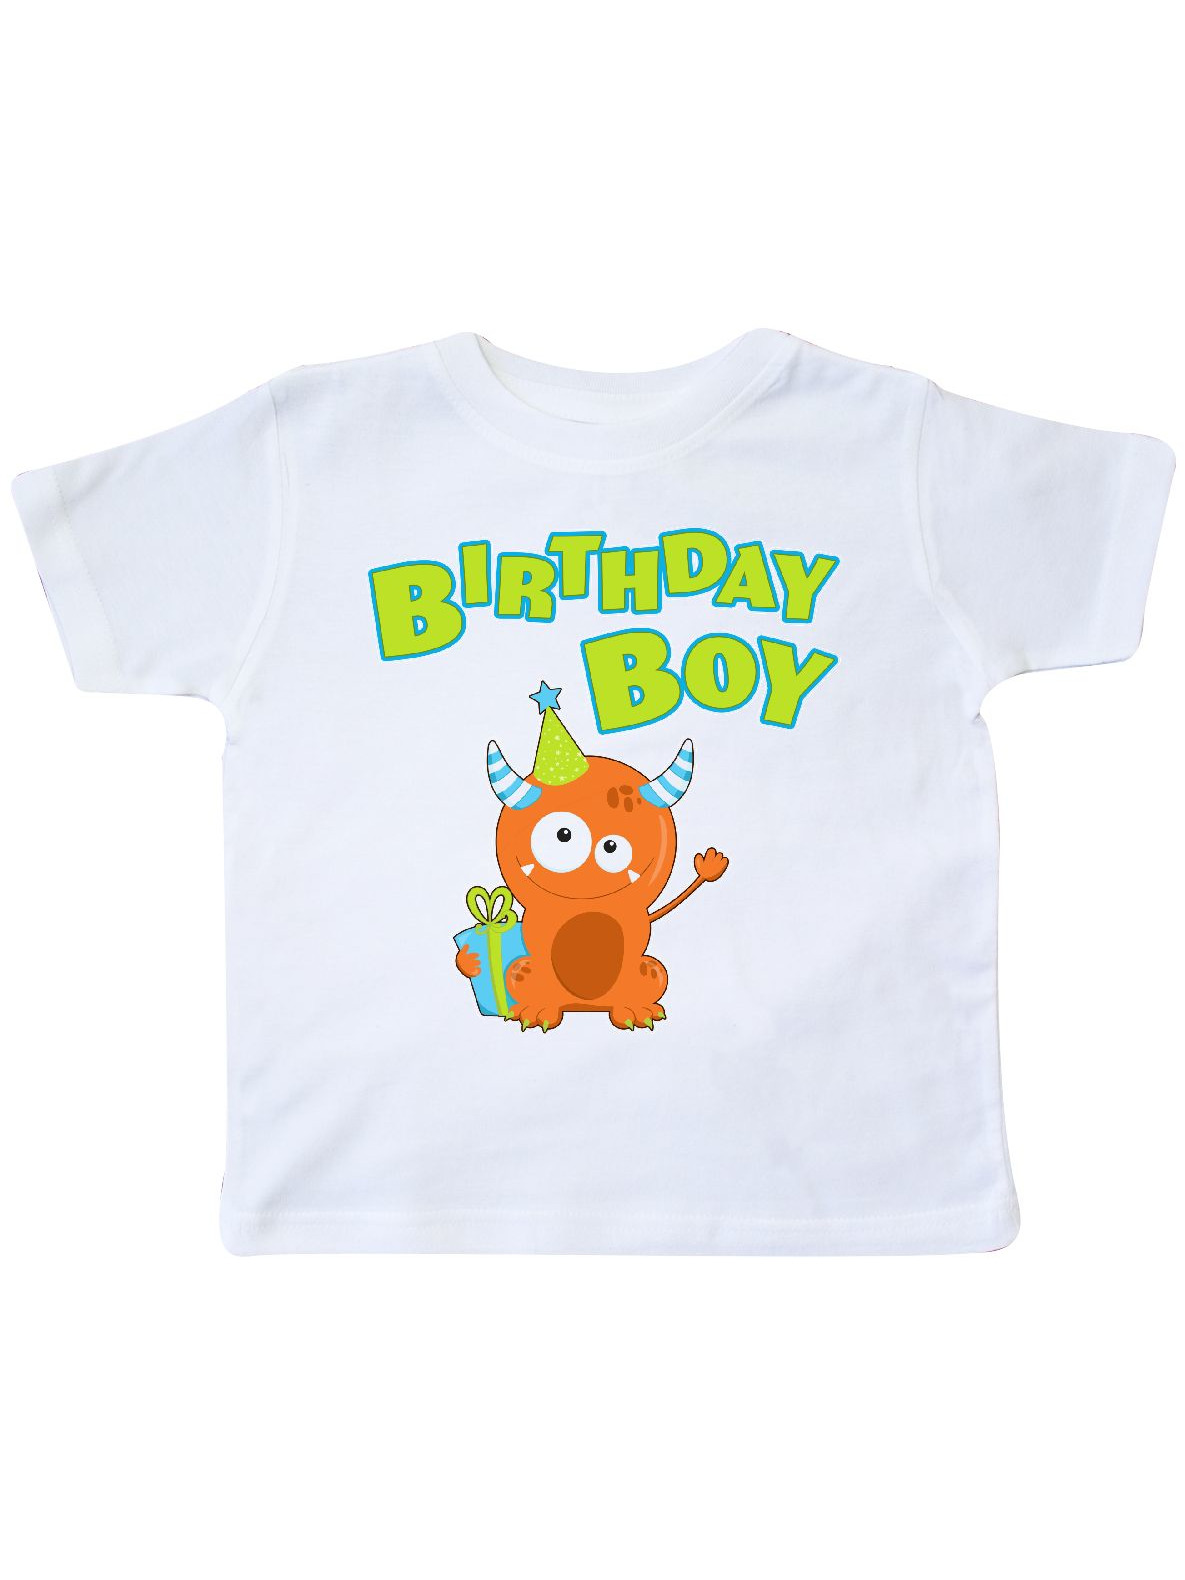 Birthday Boy Toddler T Shirt